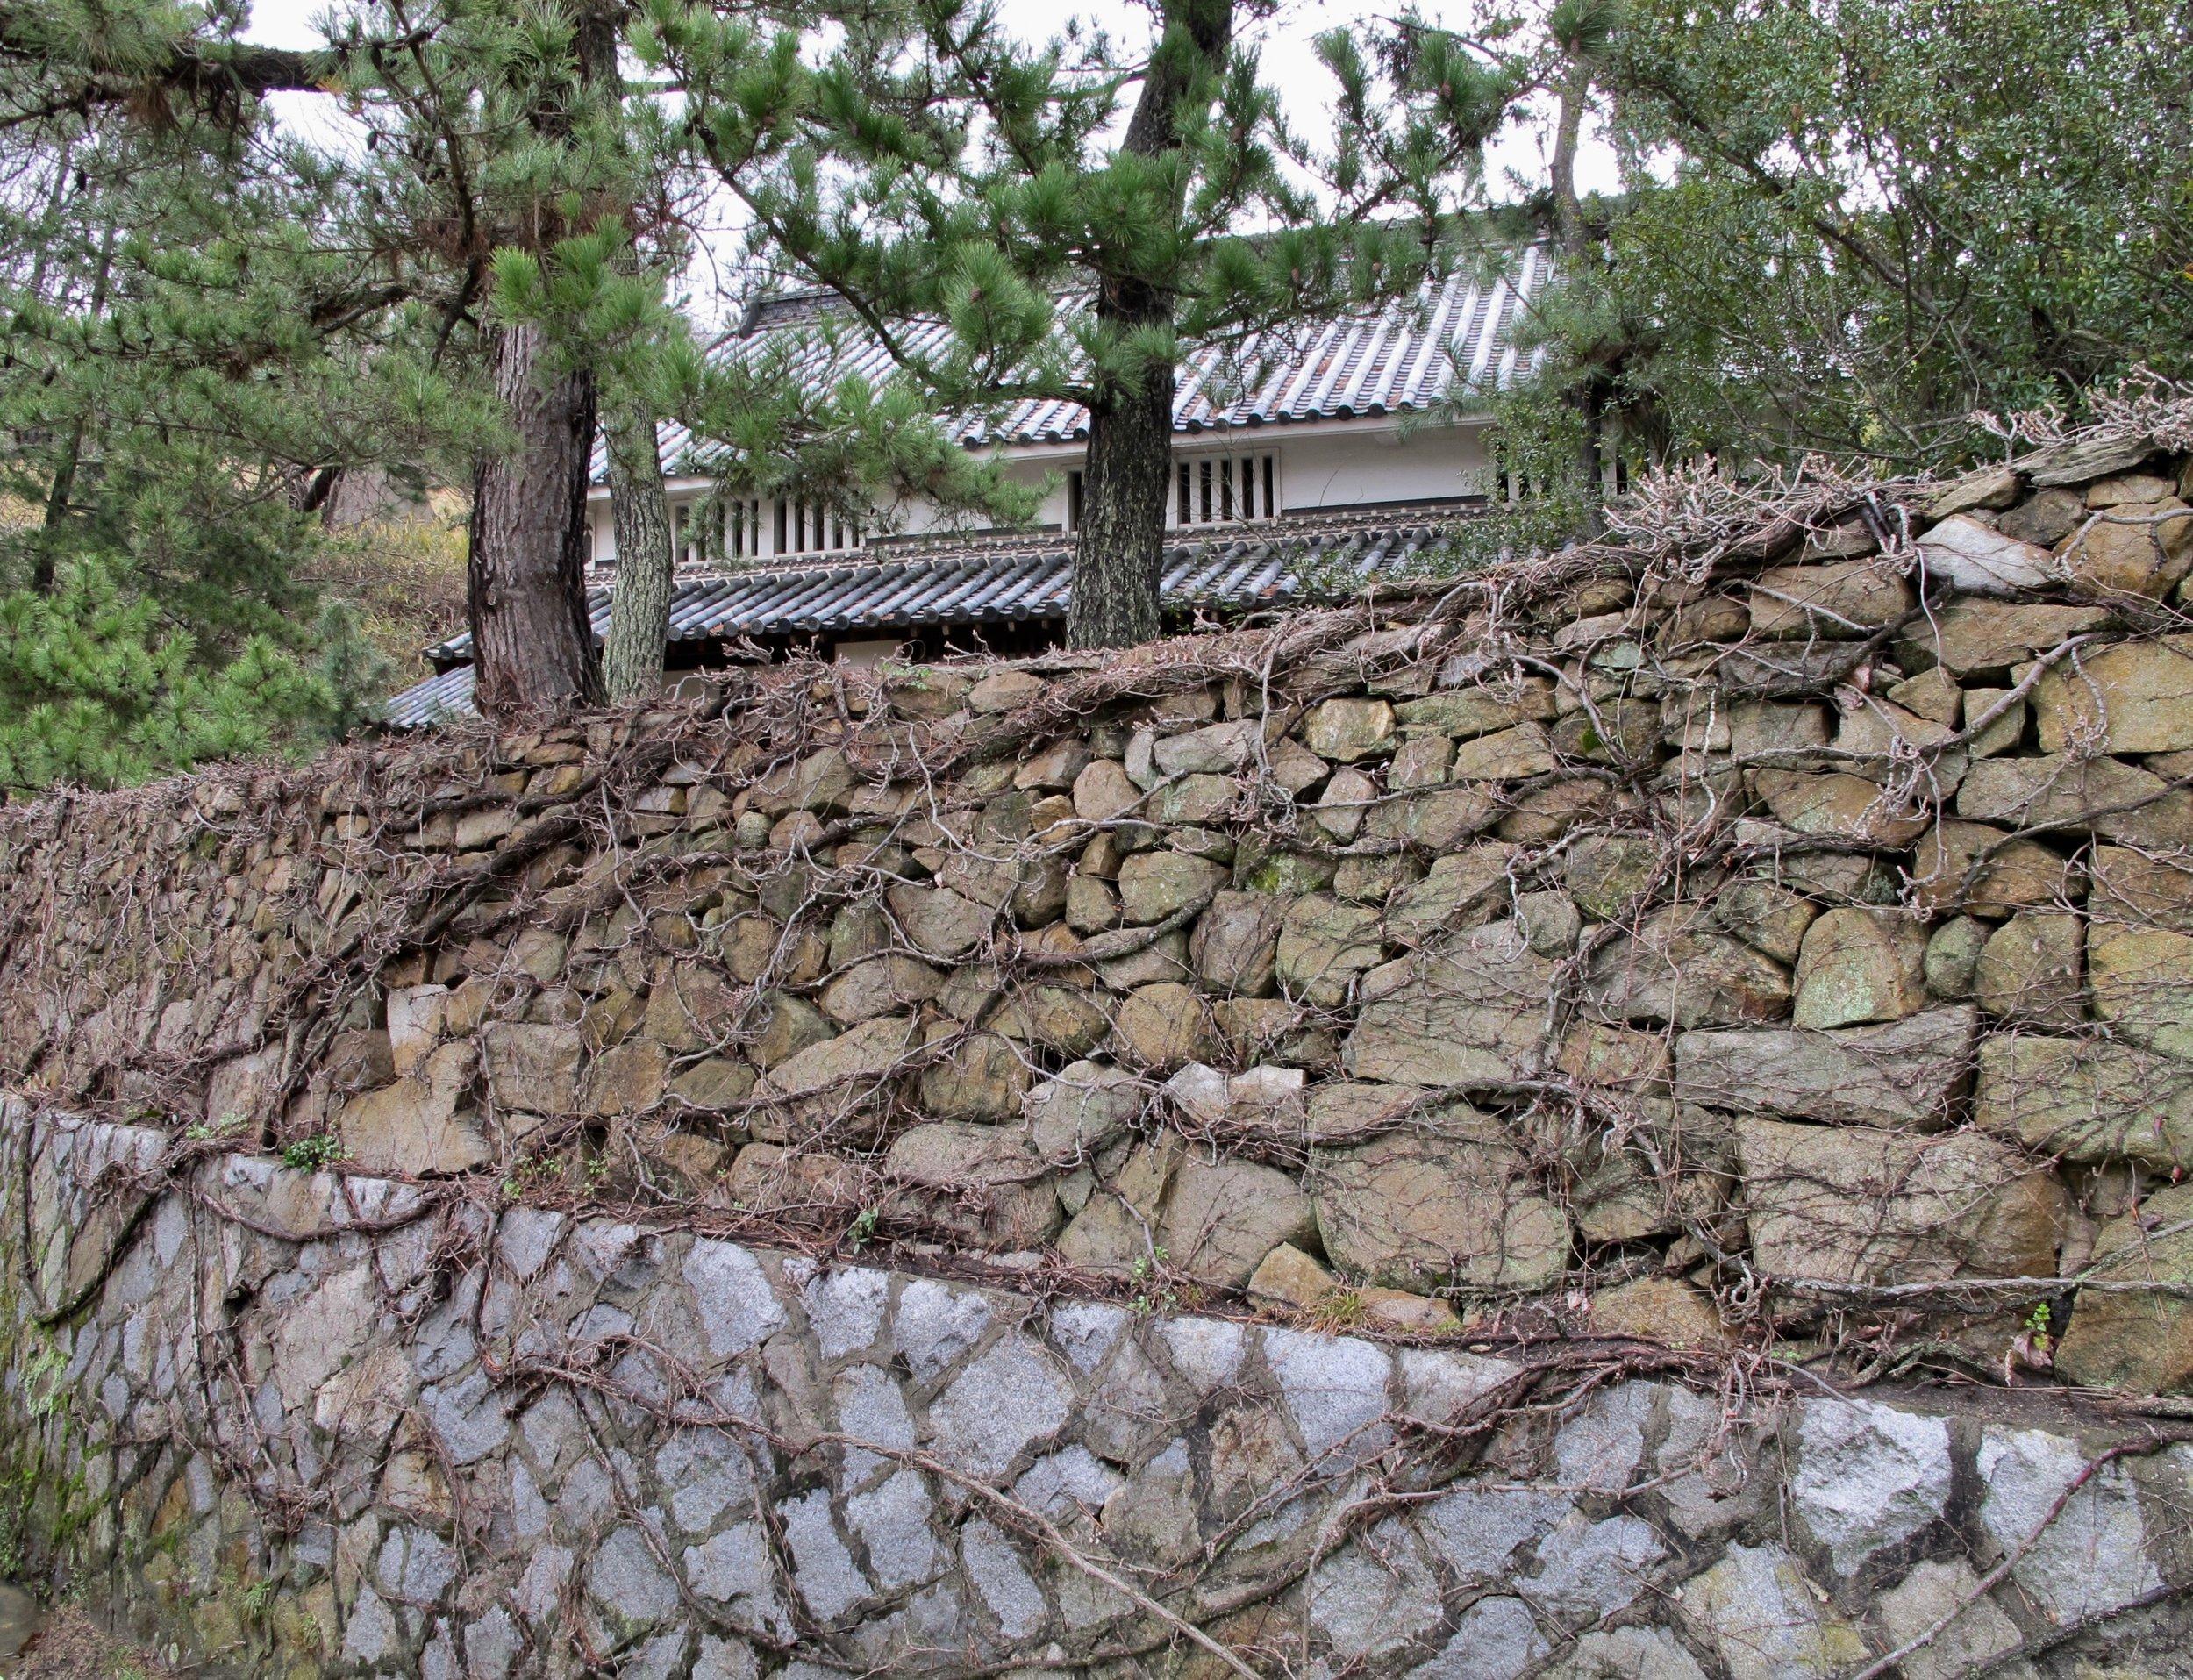 Isamu Noguchi's house on the property.